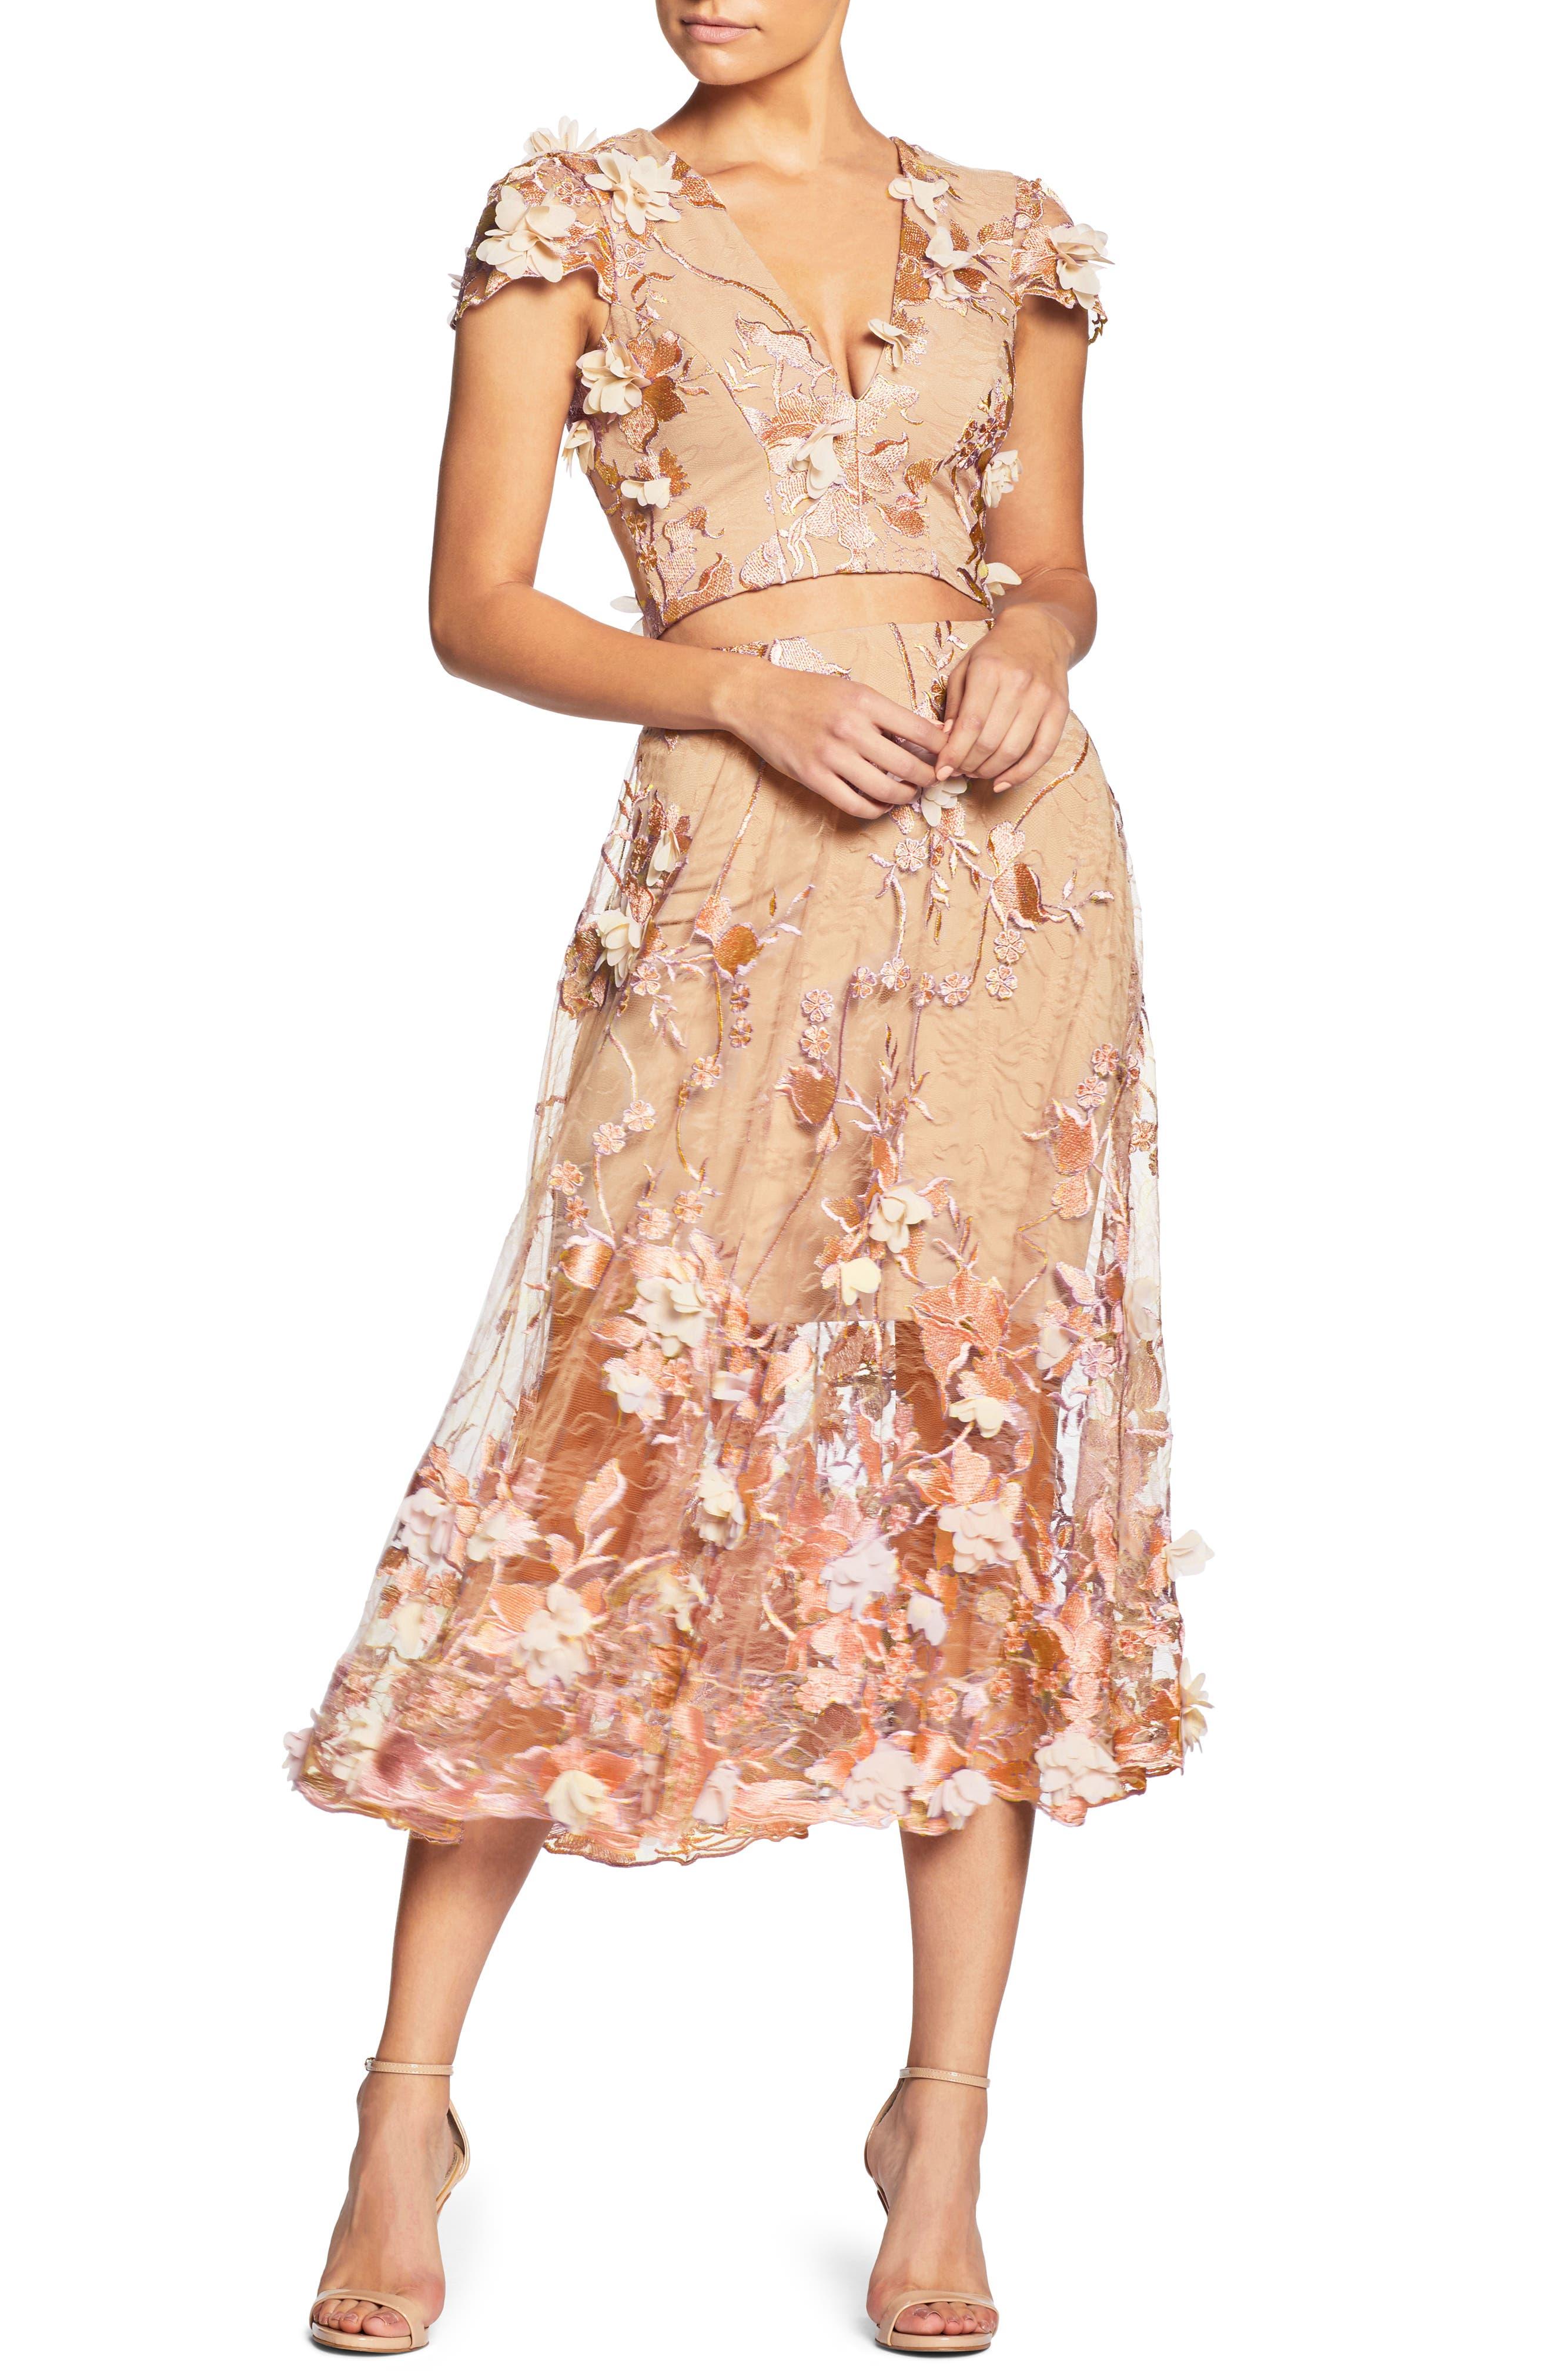 Juliana 3D Lace Two-Piece Dress,                         Main,                         color, Peach